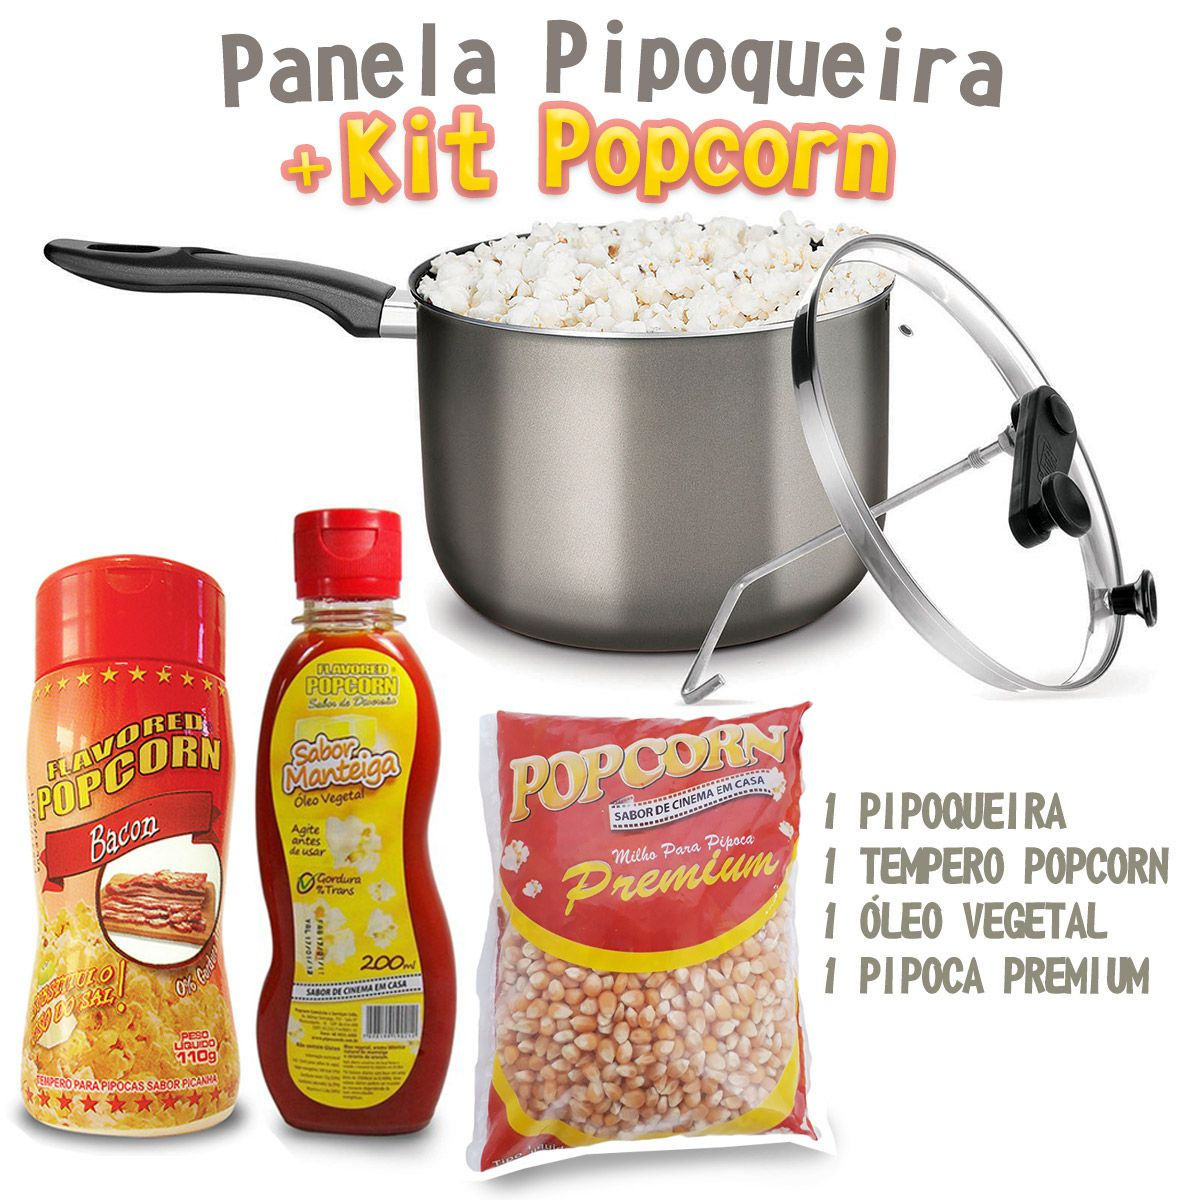 Panela Pipoqueira Antiaderente com Tampa de Vidro + Kit Popcorn e brinde surpresa!